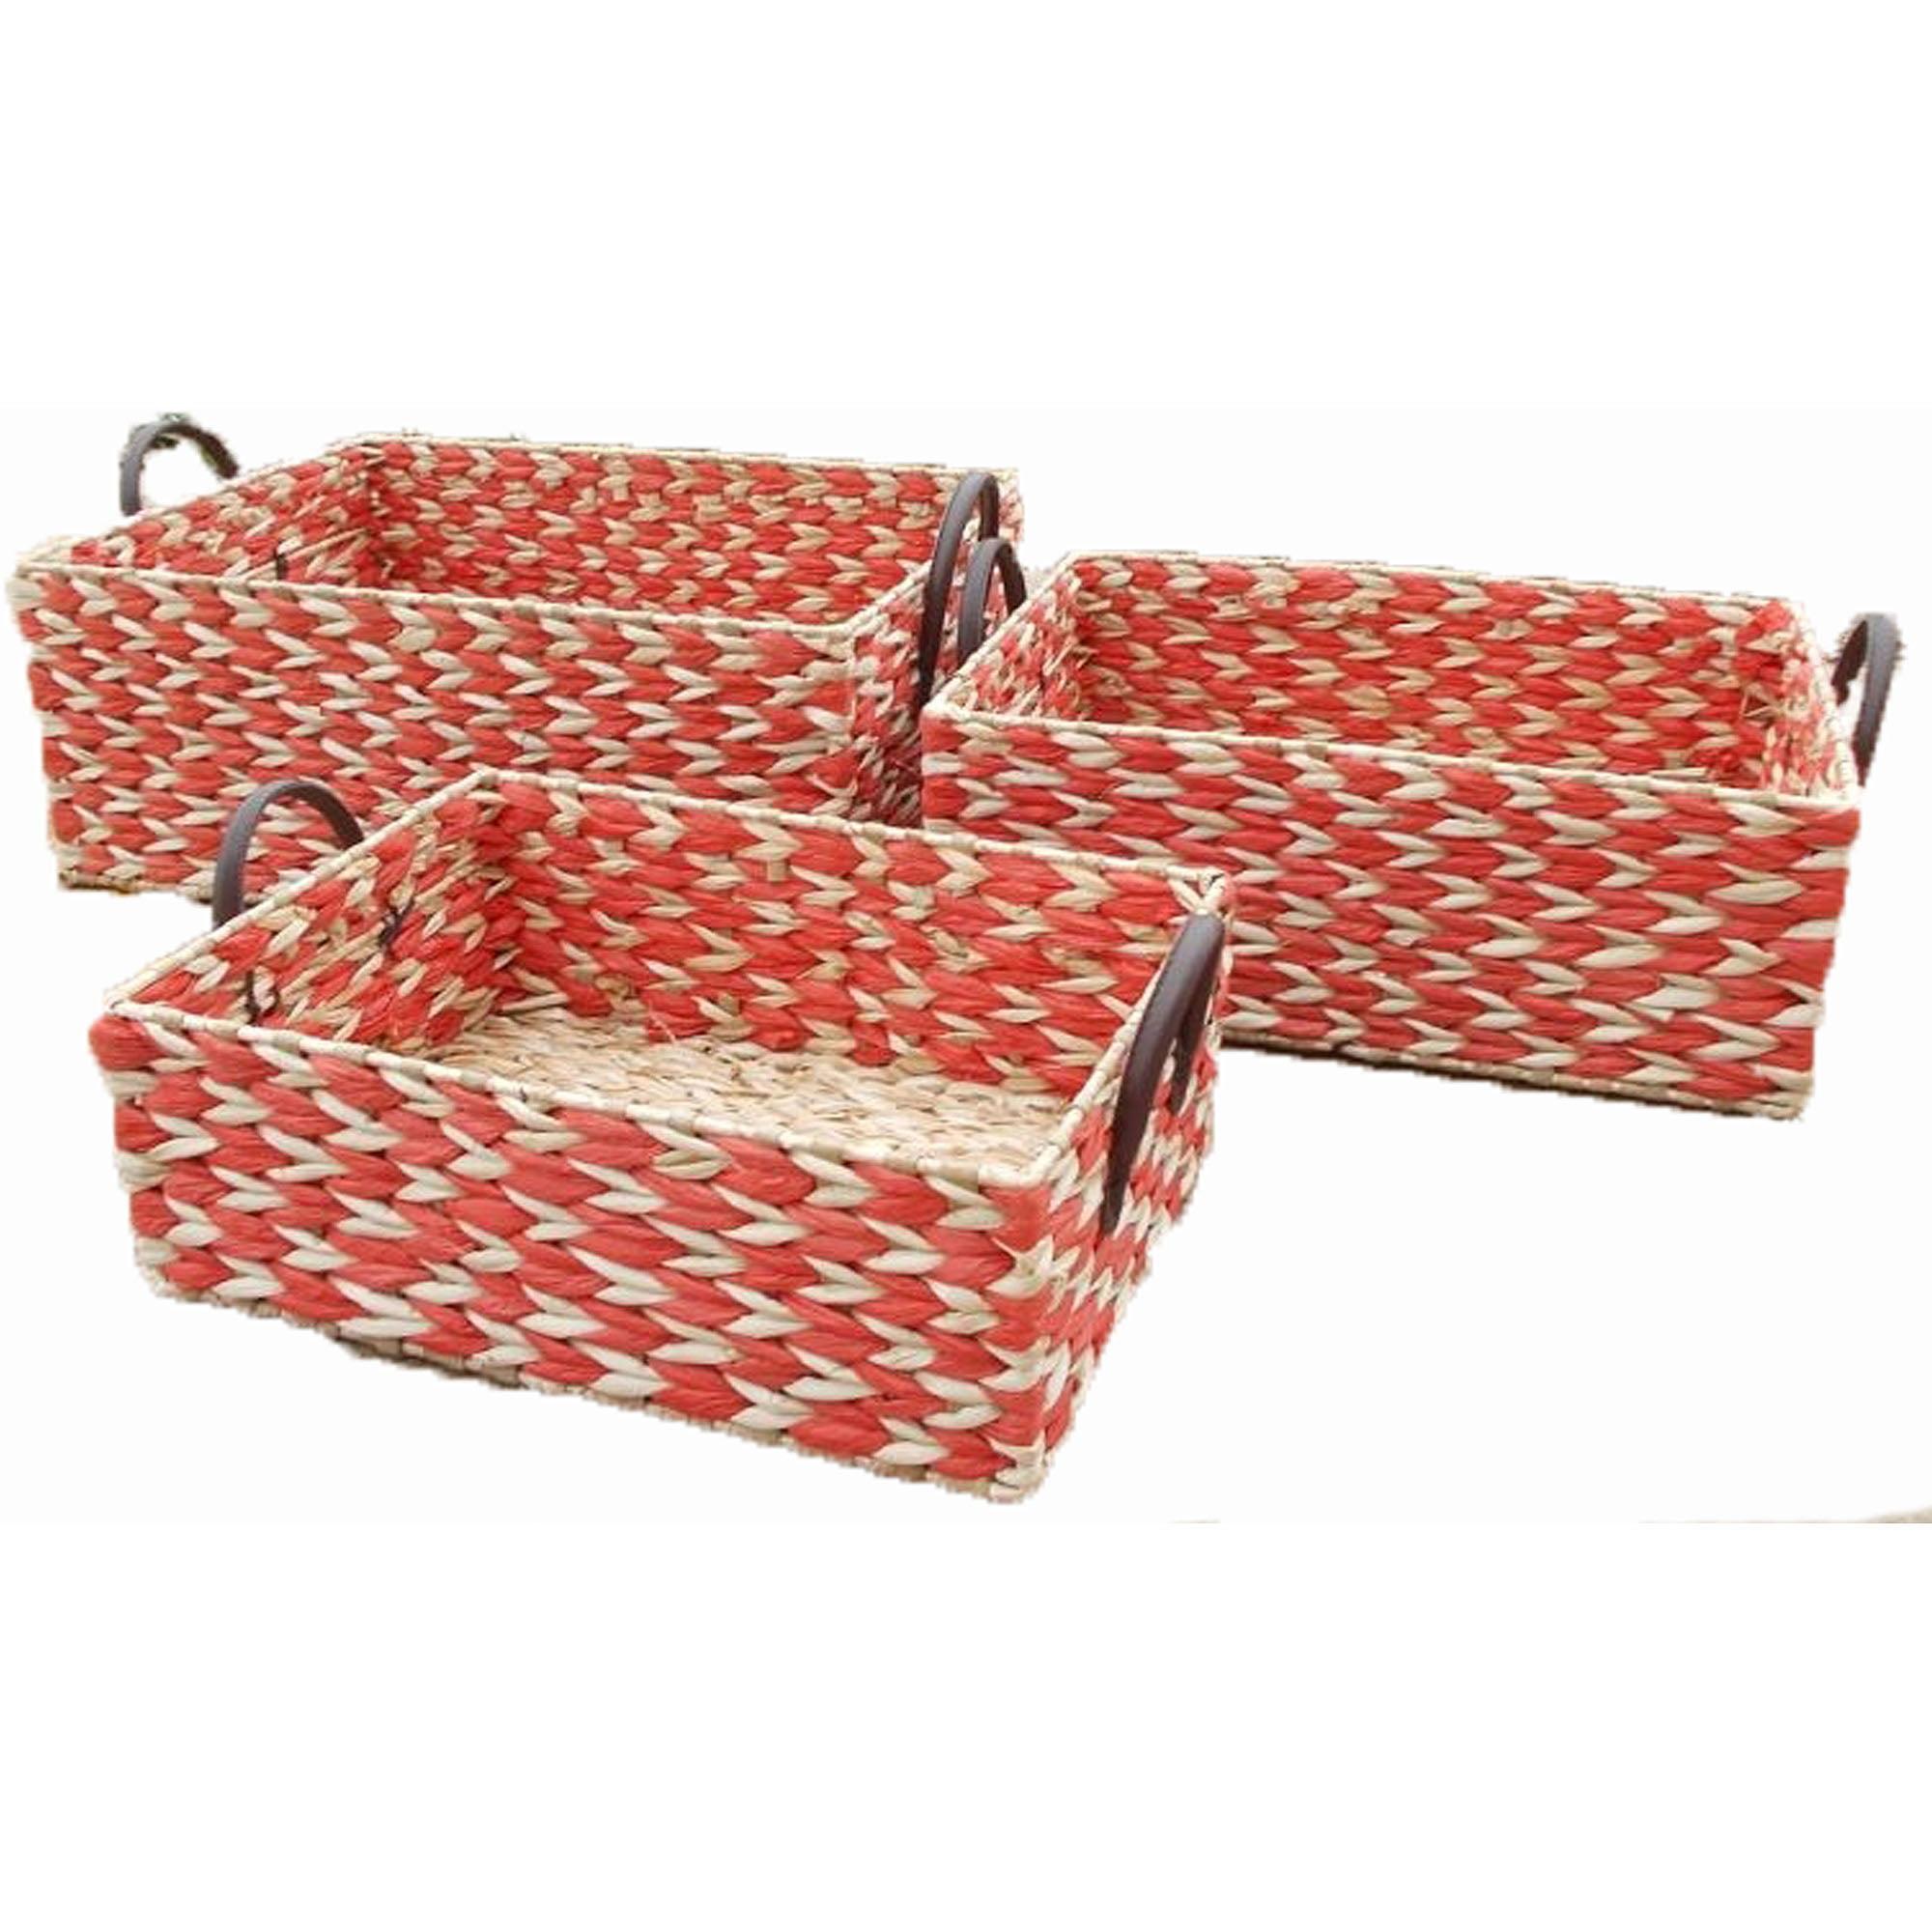 Baum 2-Tone Rush Baskets, Set of 3, Red